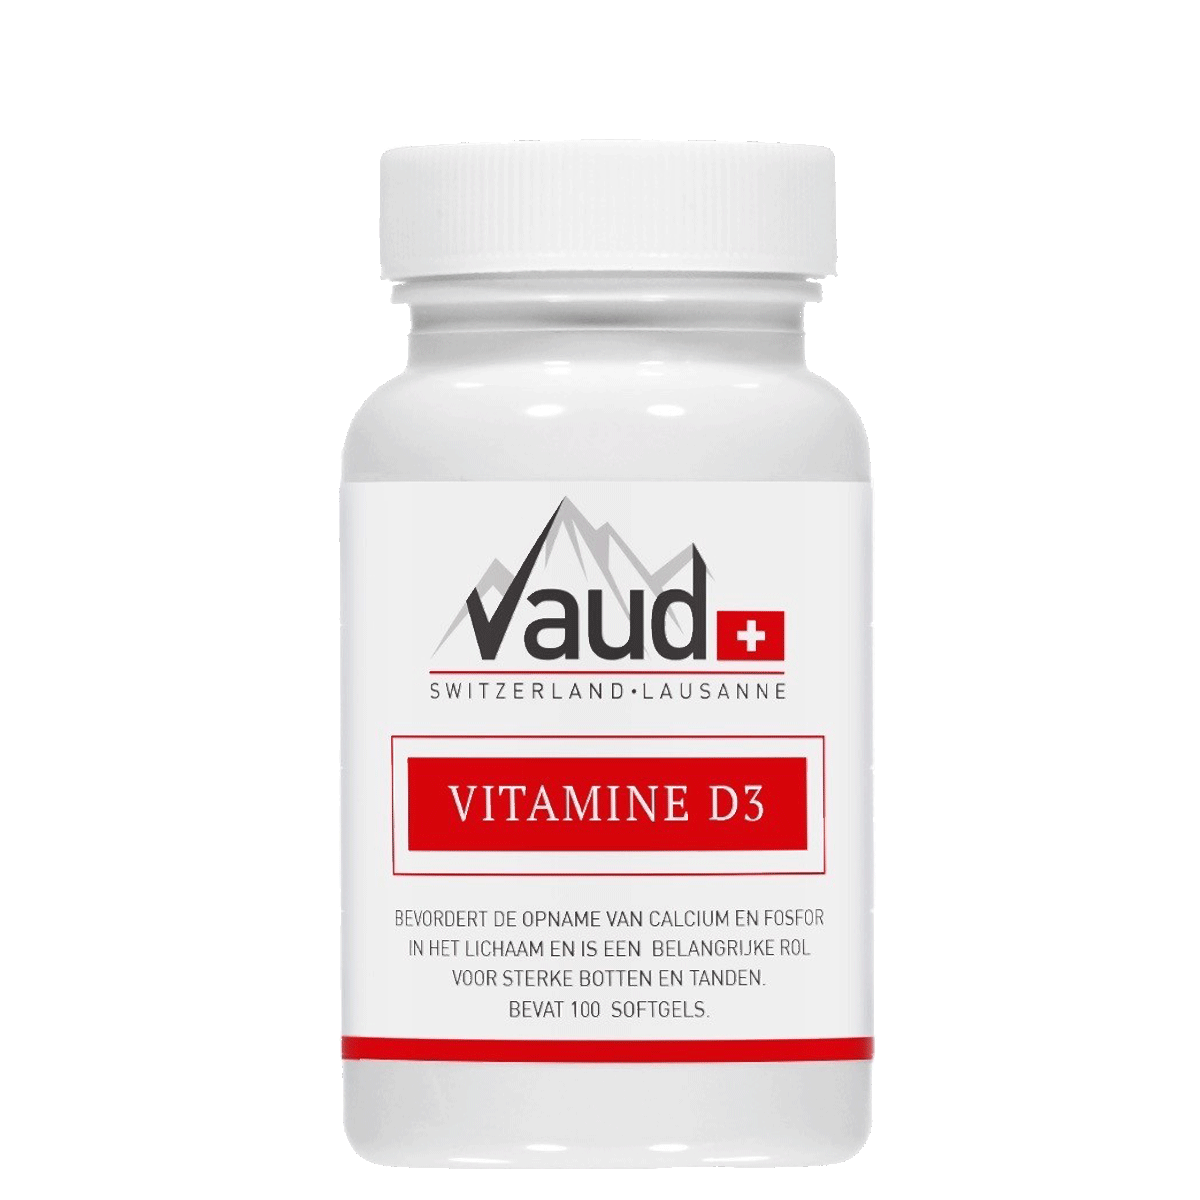 Vitamine D3 sterke botten en tanden